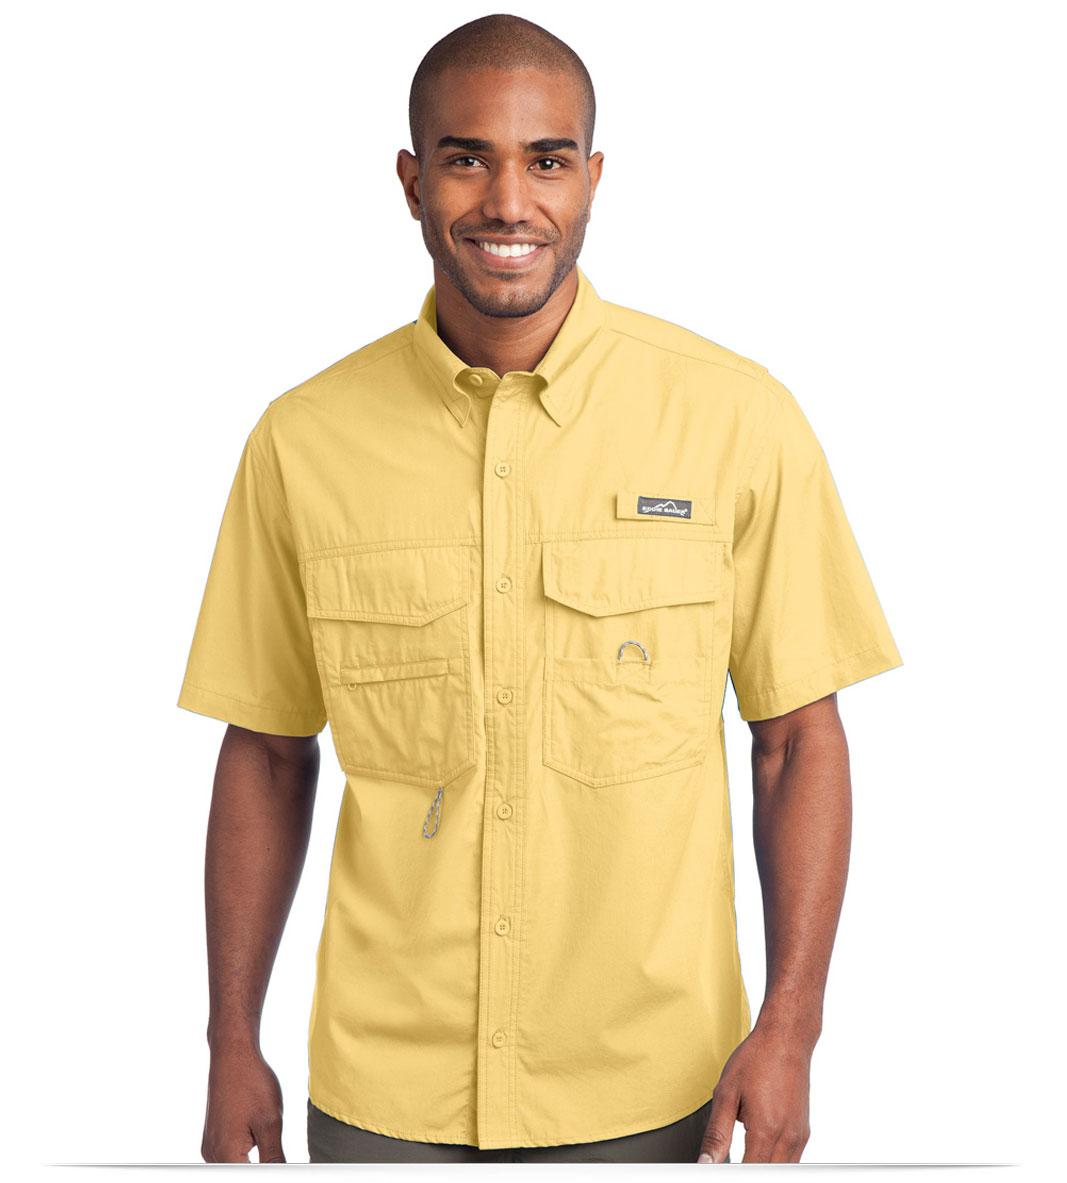 Customize Eddie Bauer Short Sleeve Fishing Shirt